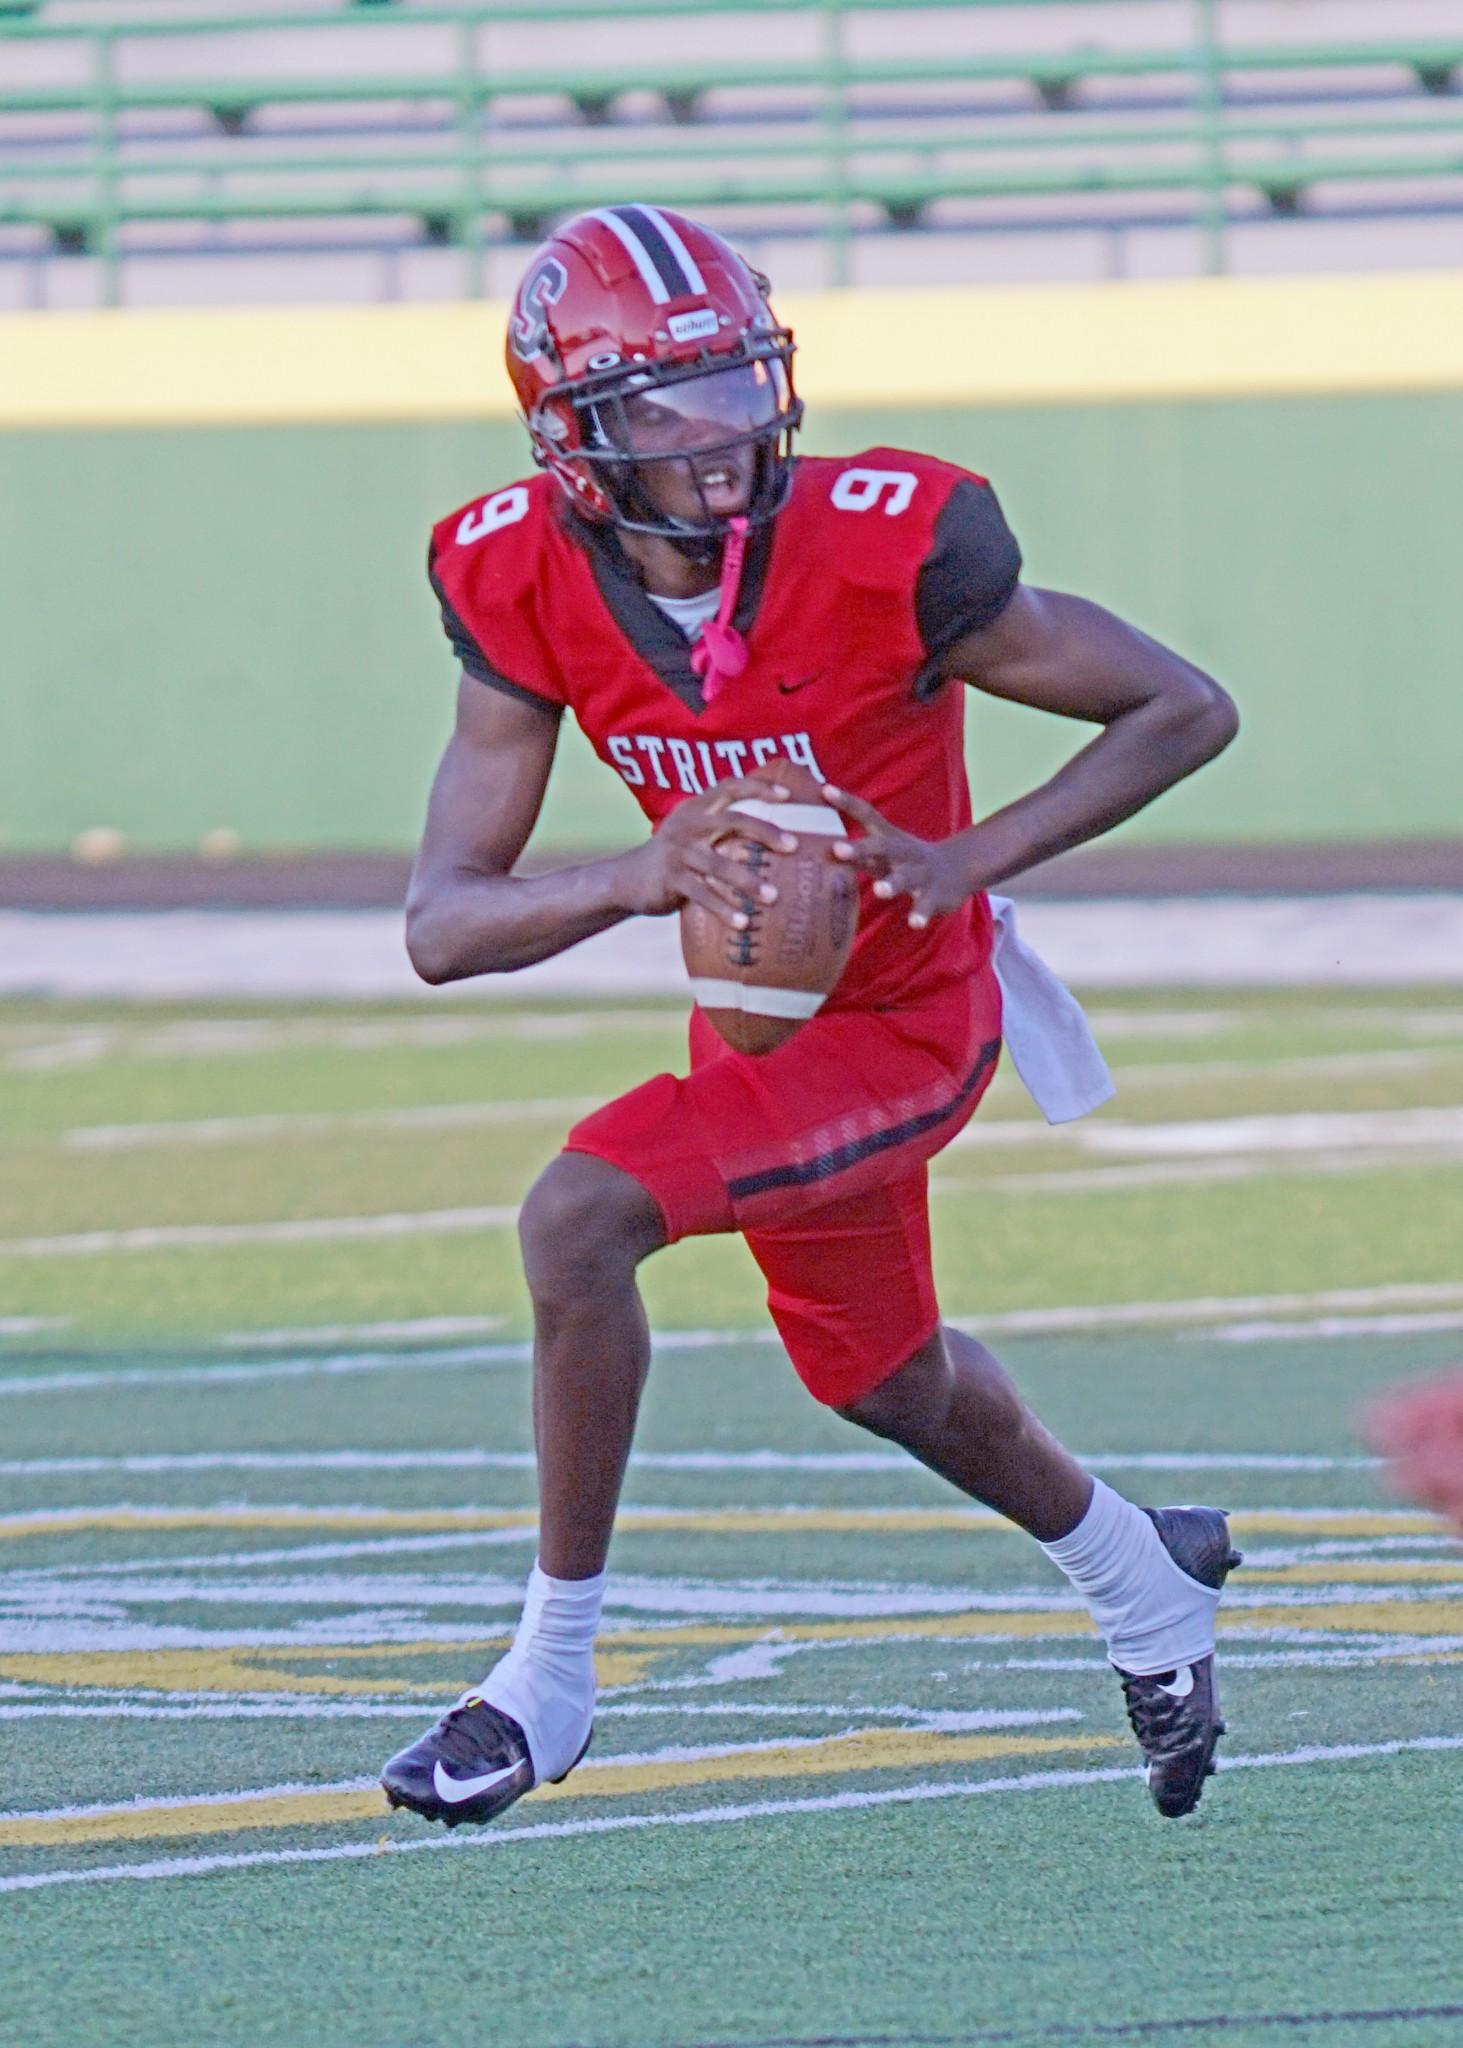 "Cardinal Stritch senior quarterback Thomas Foust. (Press photo by Doug Karns/<a href=""http://www.DougKarns.smugmug.com"">www.DougKarns.smugmug.com</a>)"